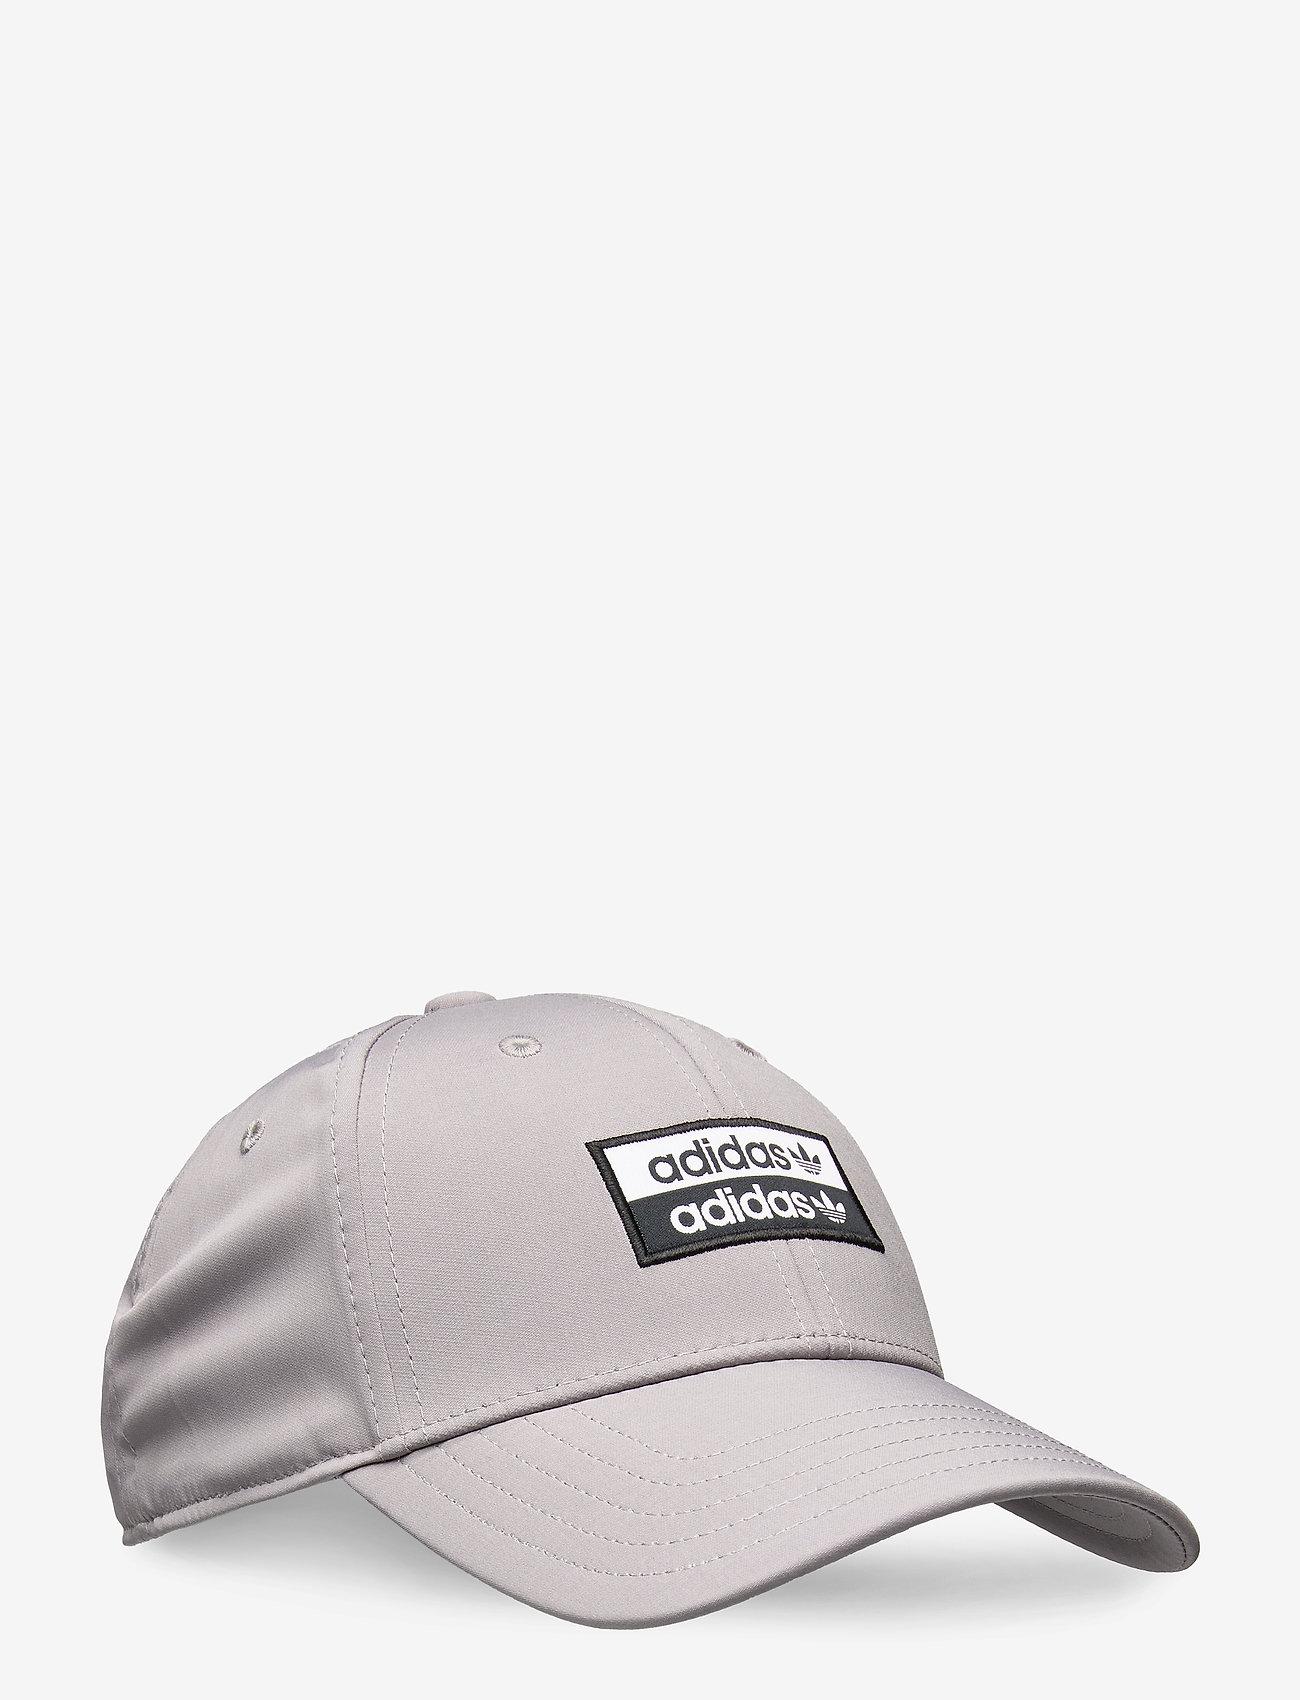 adidas Originals - BBALL - caps - dovgry - 0